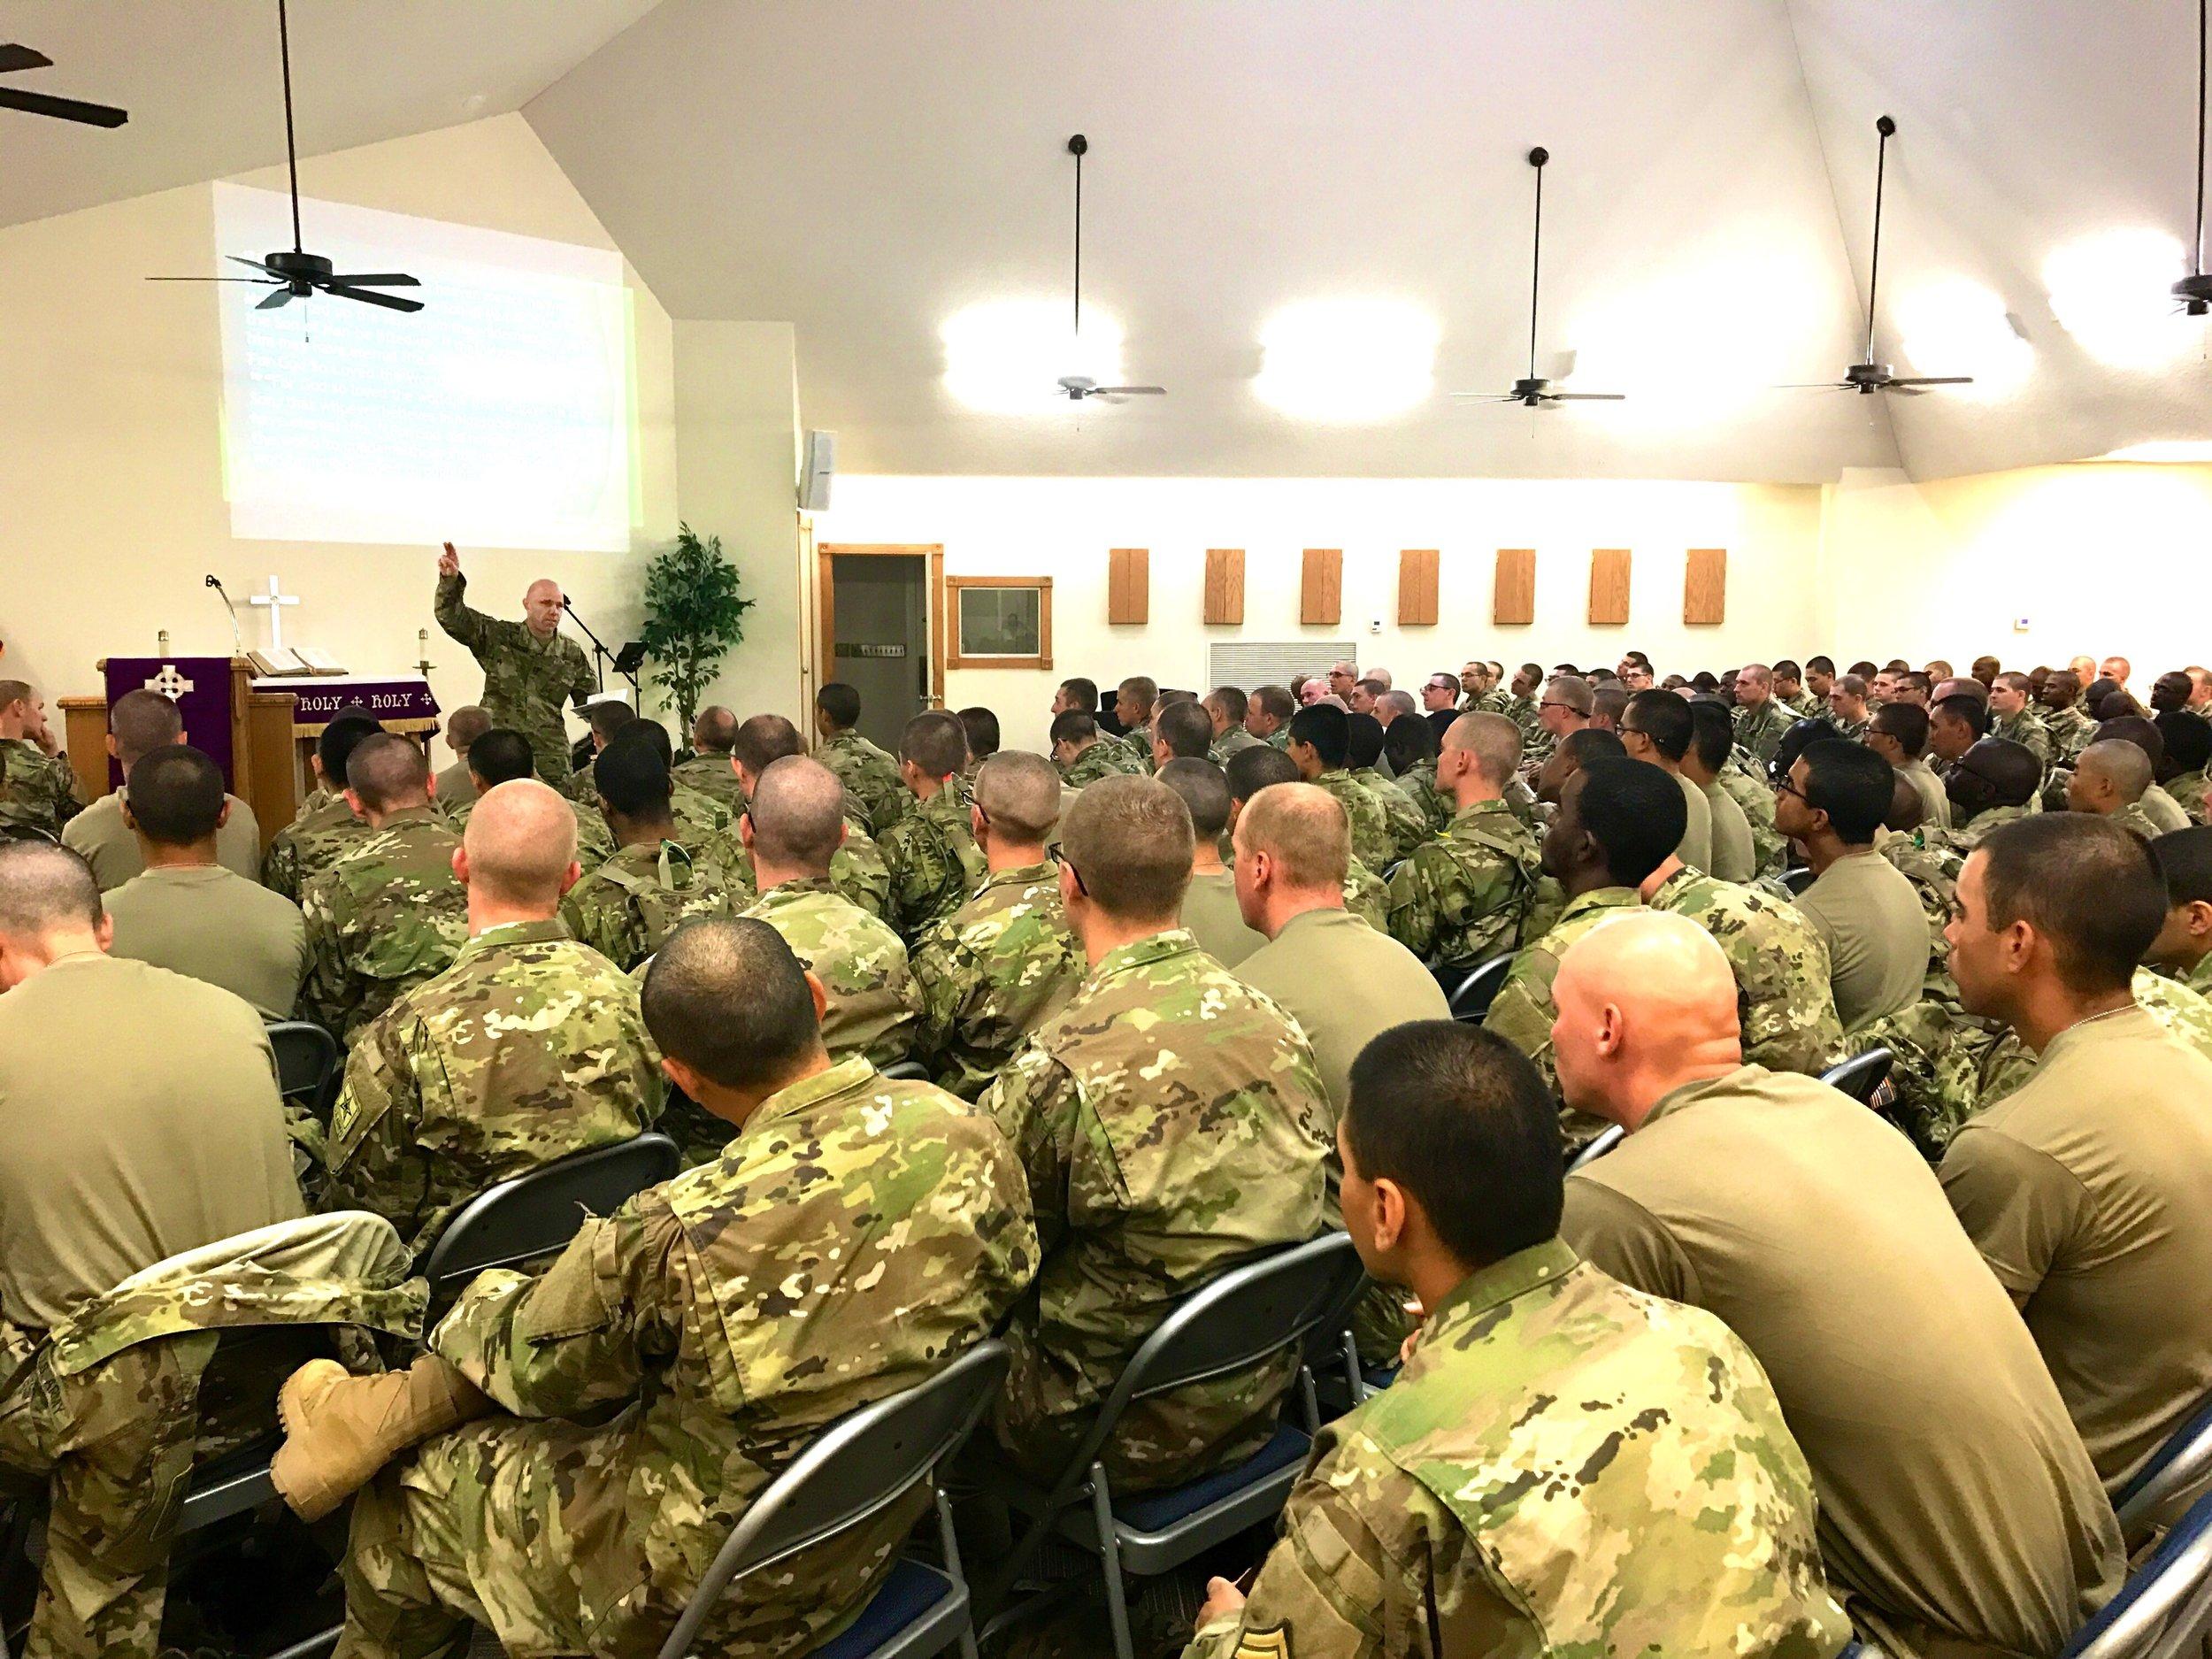 Chaplain Caleb Schumacher Soldiers Chapel